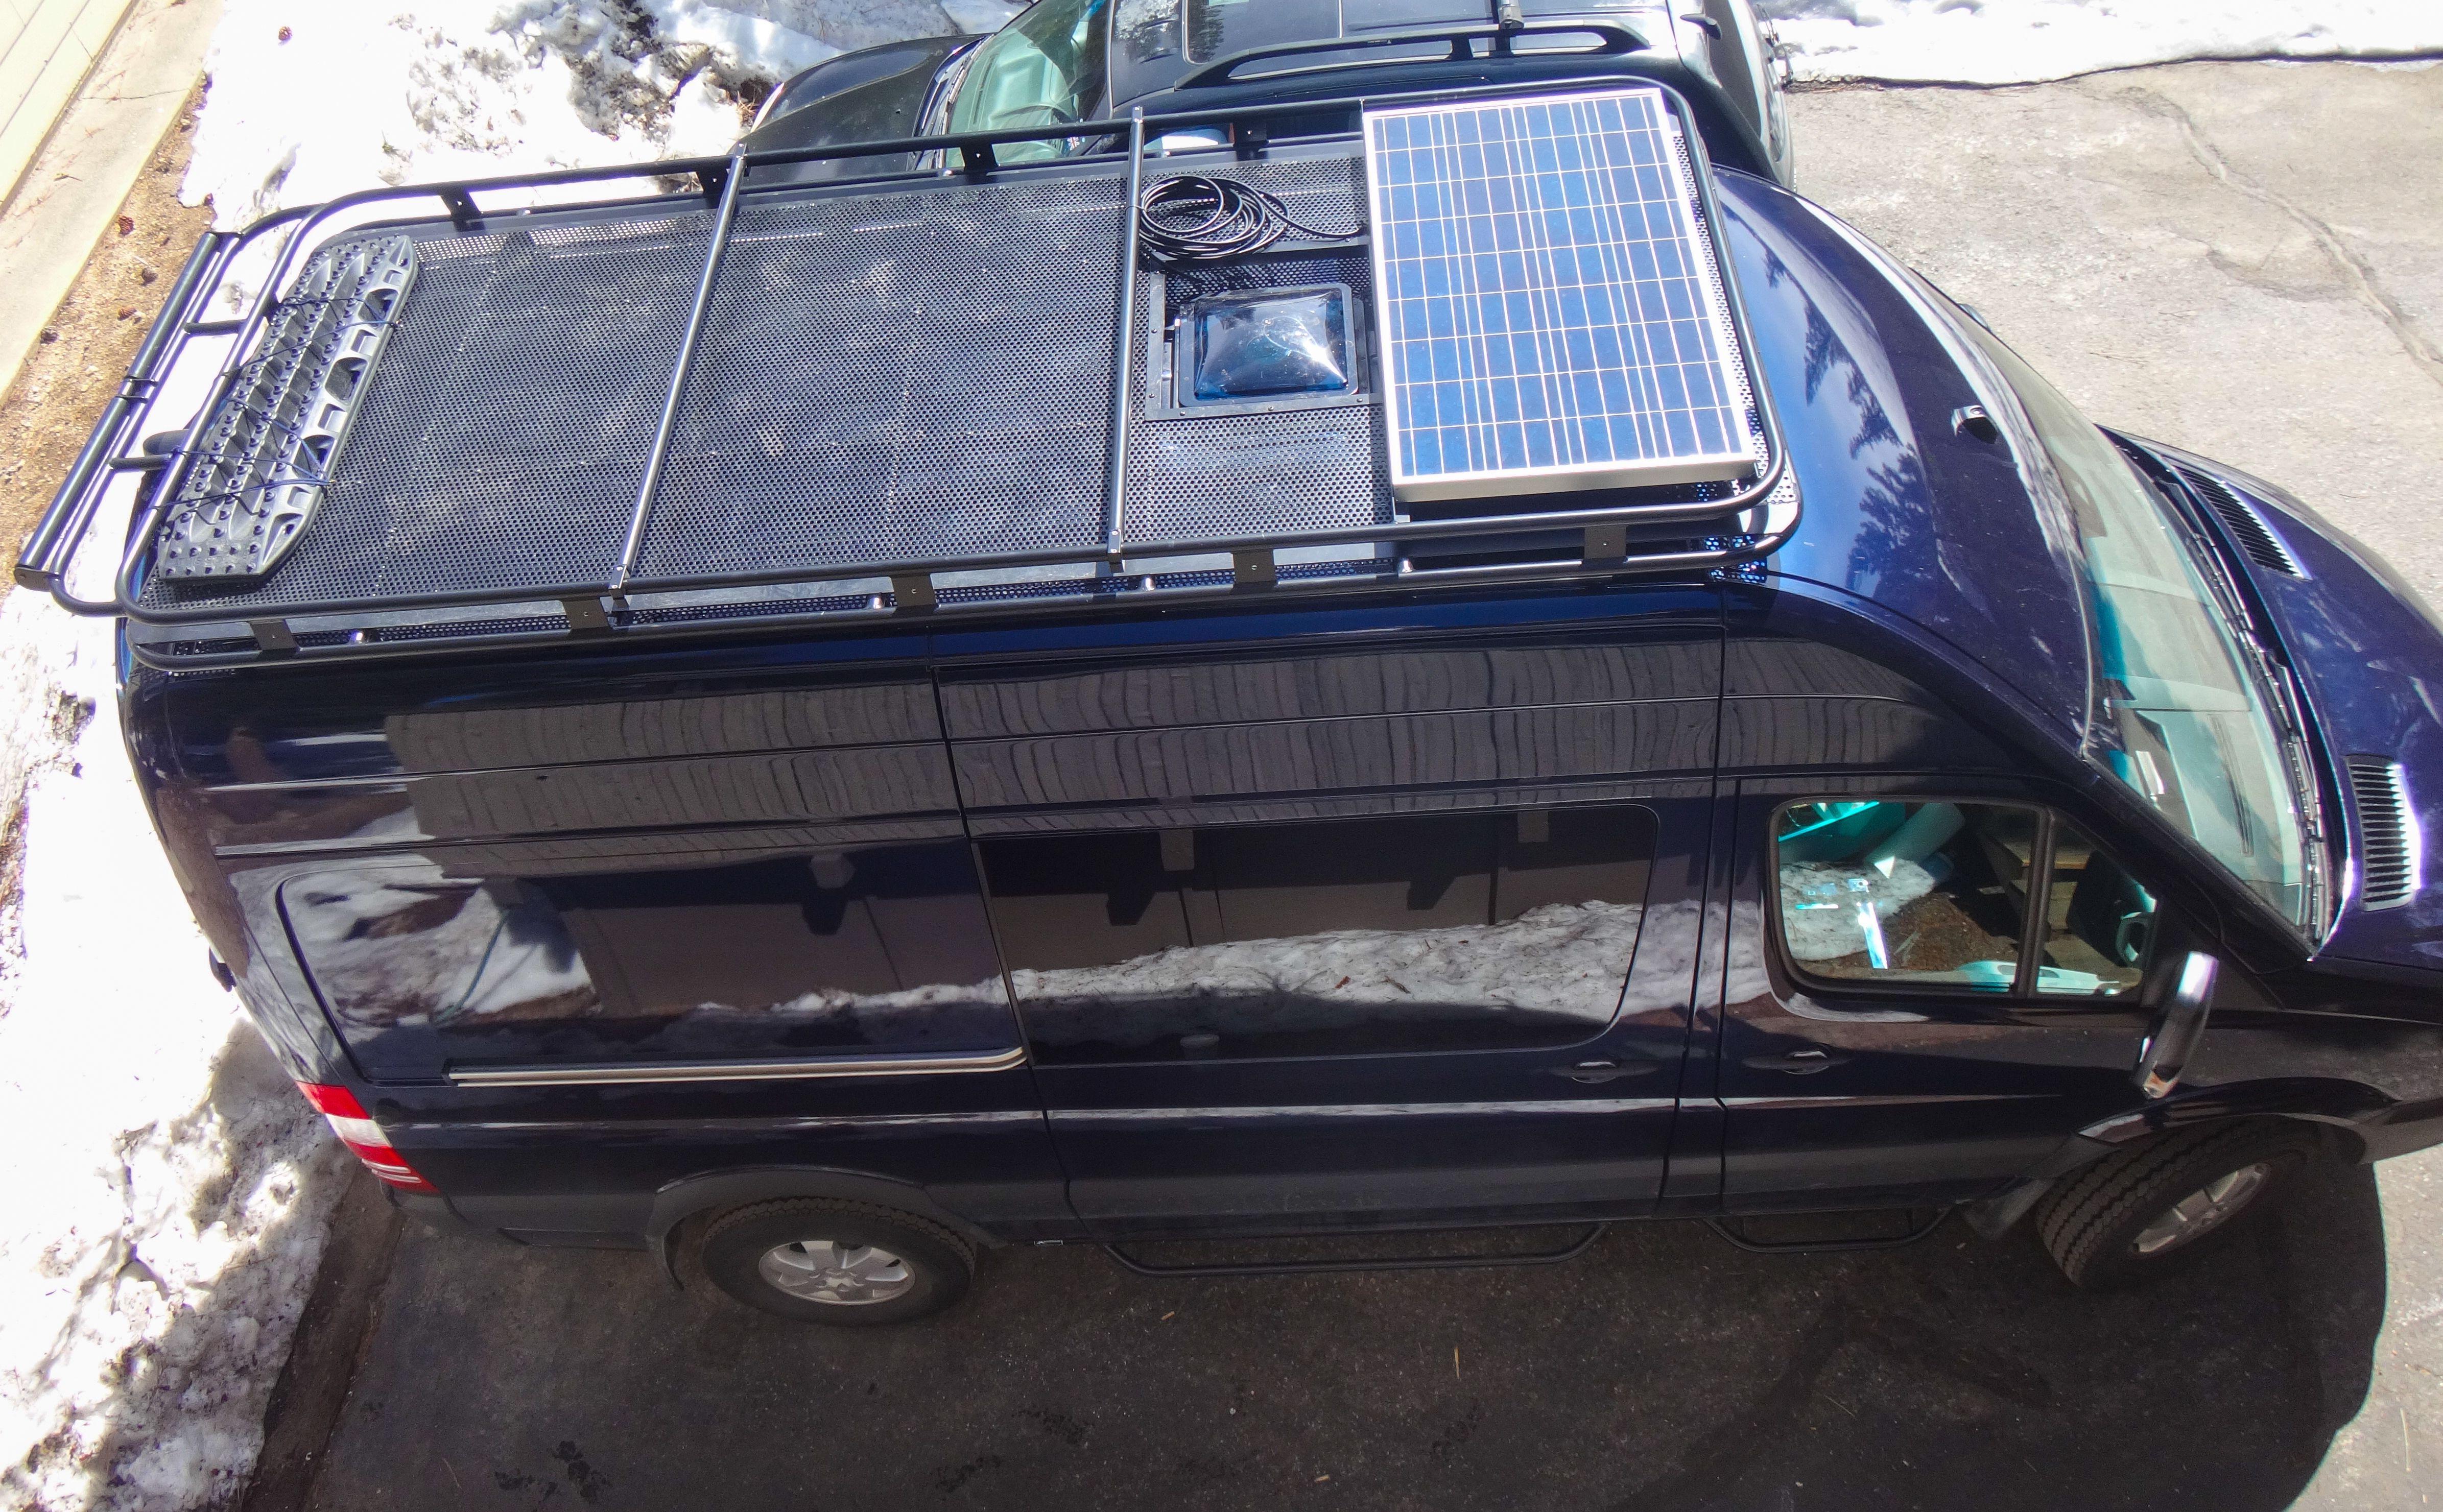 Aluminess Roof Rack For Mercedes Sprinter Solar Panel Perforated Aluminum Flooring And Boat Rollers Rv Solar Power Camper Van Conversion Diy Transit Camper